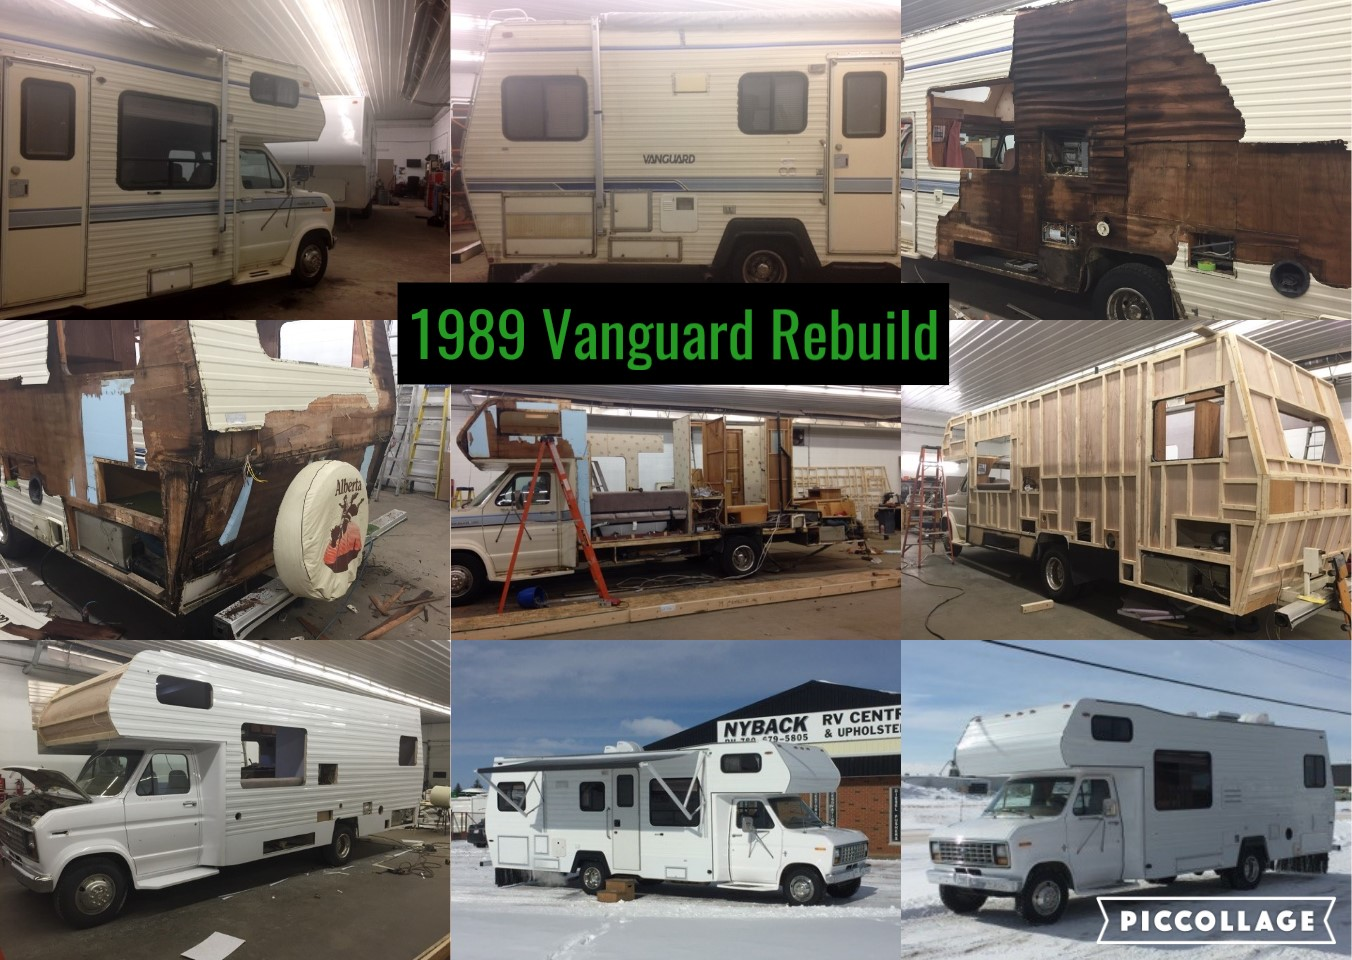 1989 Vanguard Rebuild